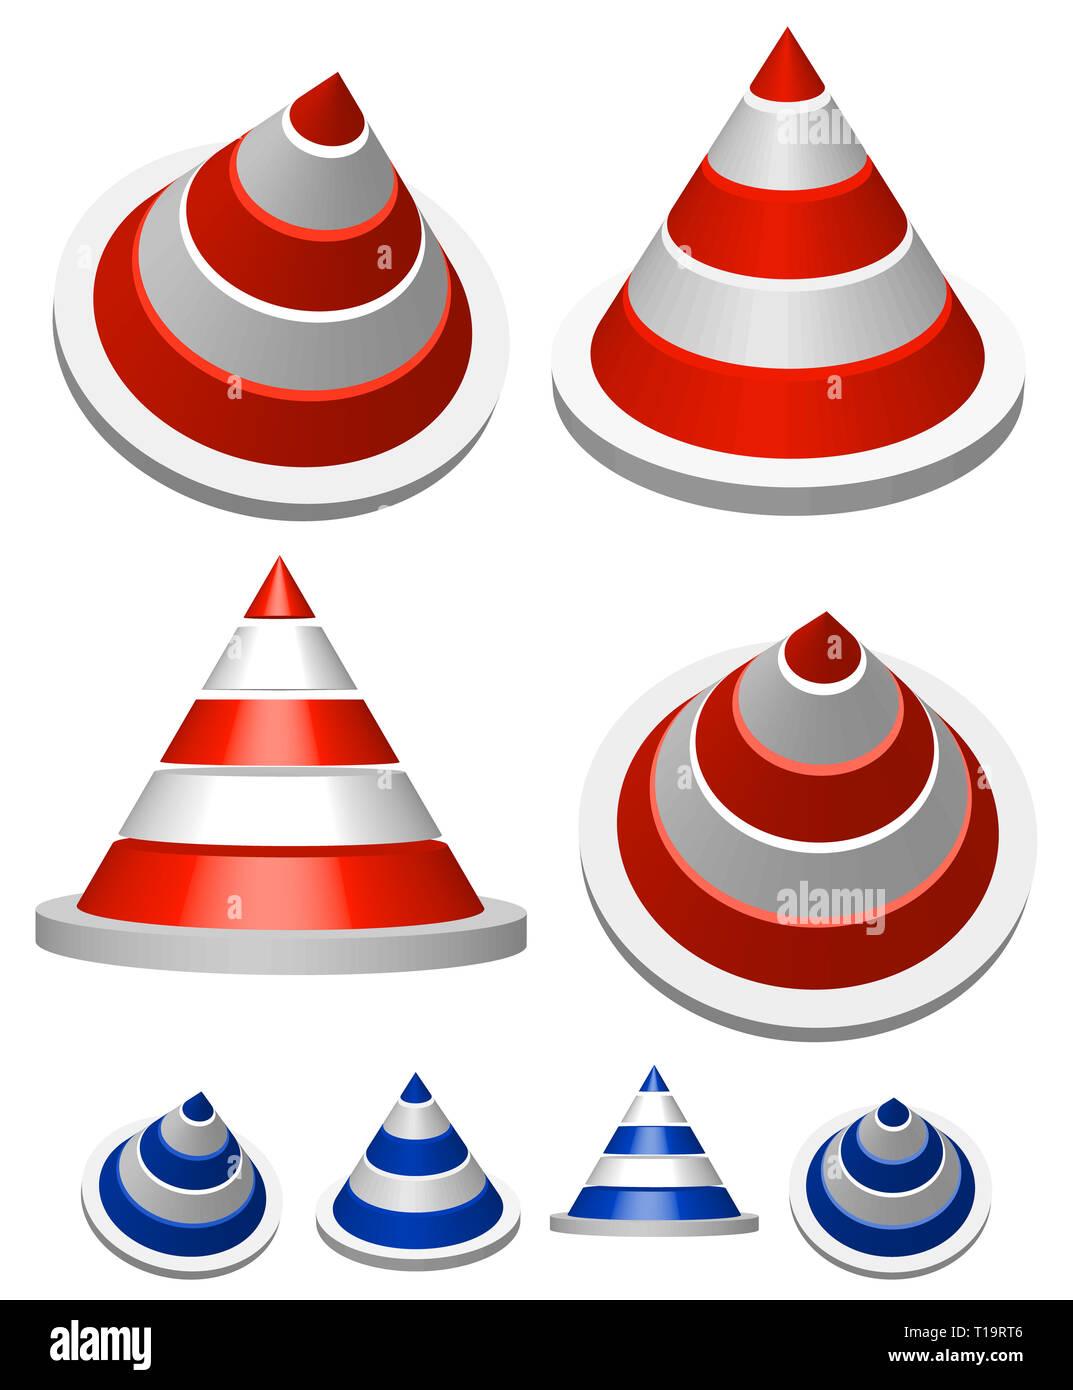 Illustration of traffic cones - Stock Image